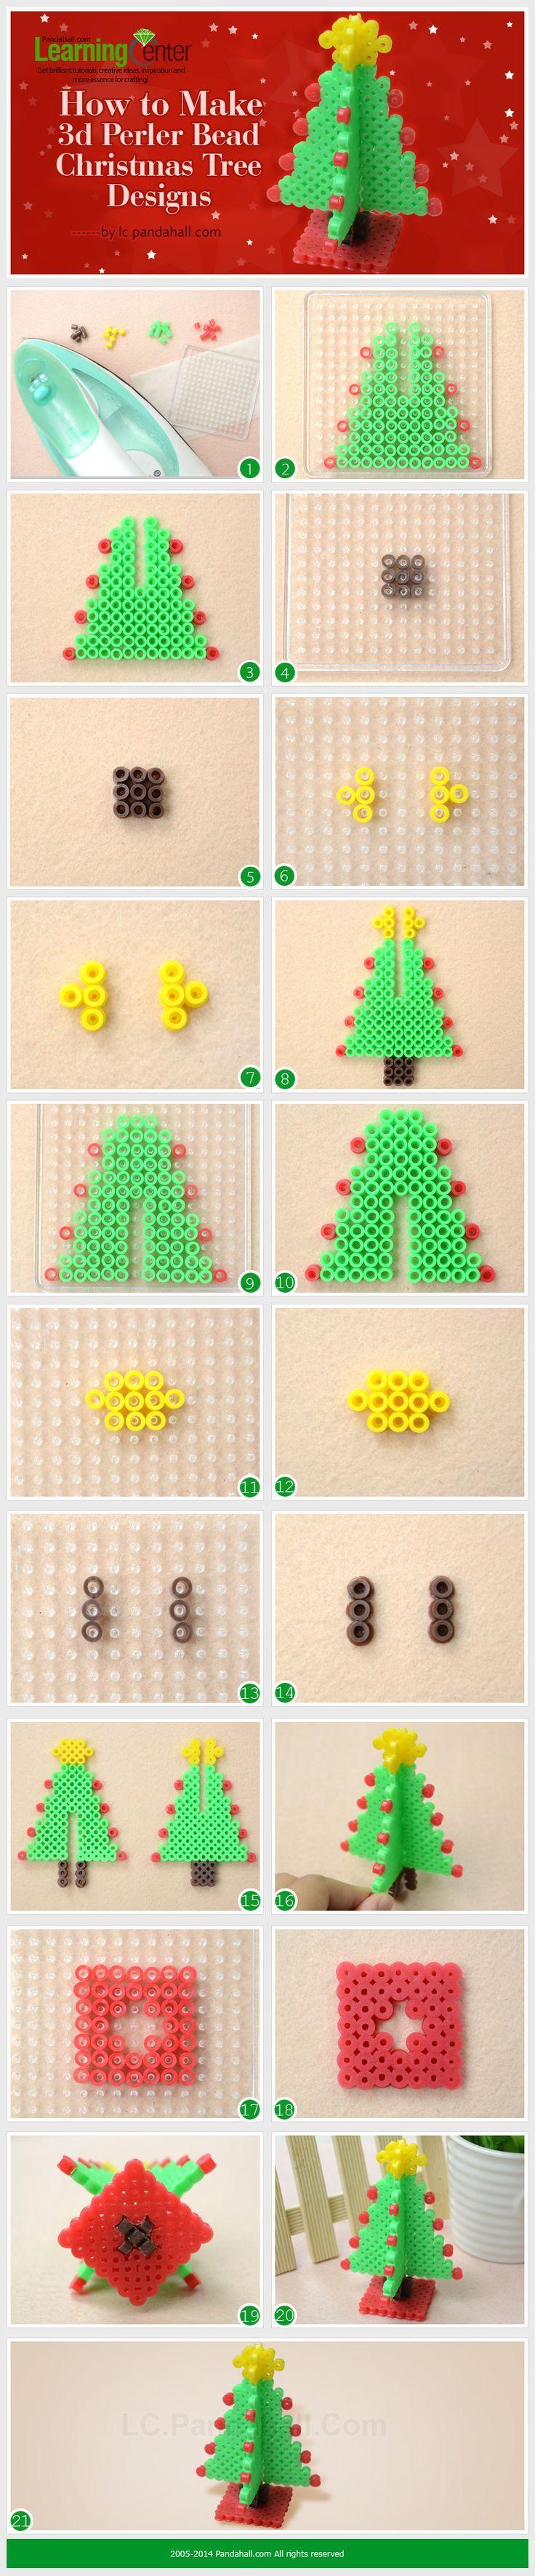 How to Make 3d Hama Bead Christmas Tree Designs